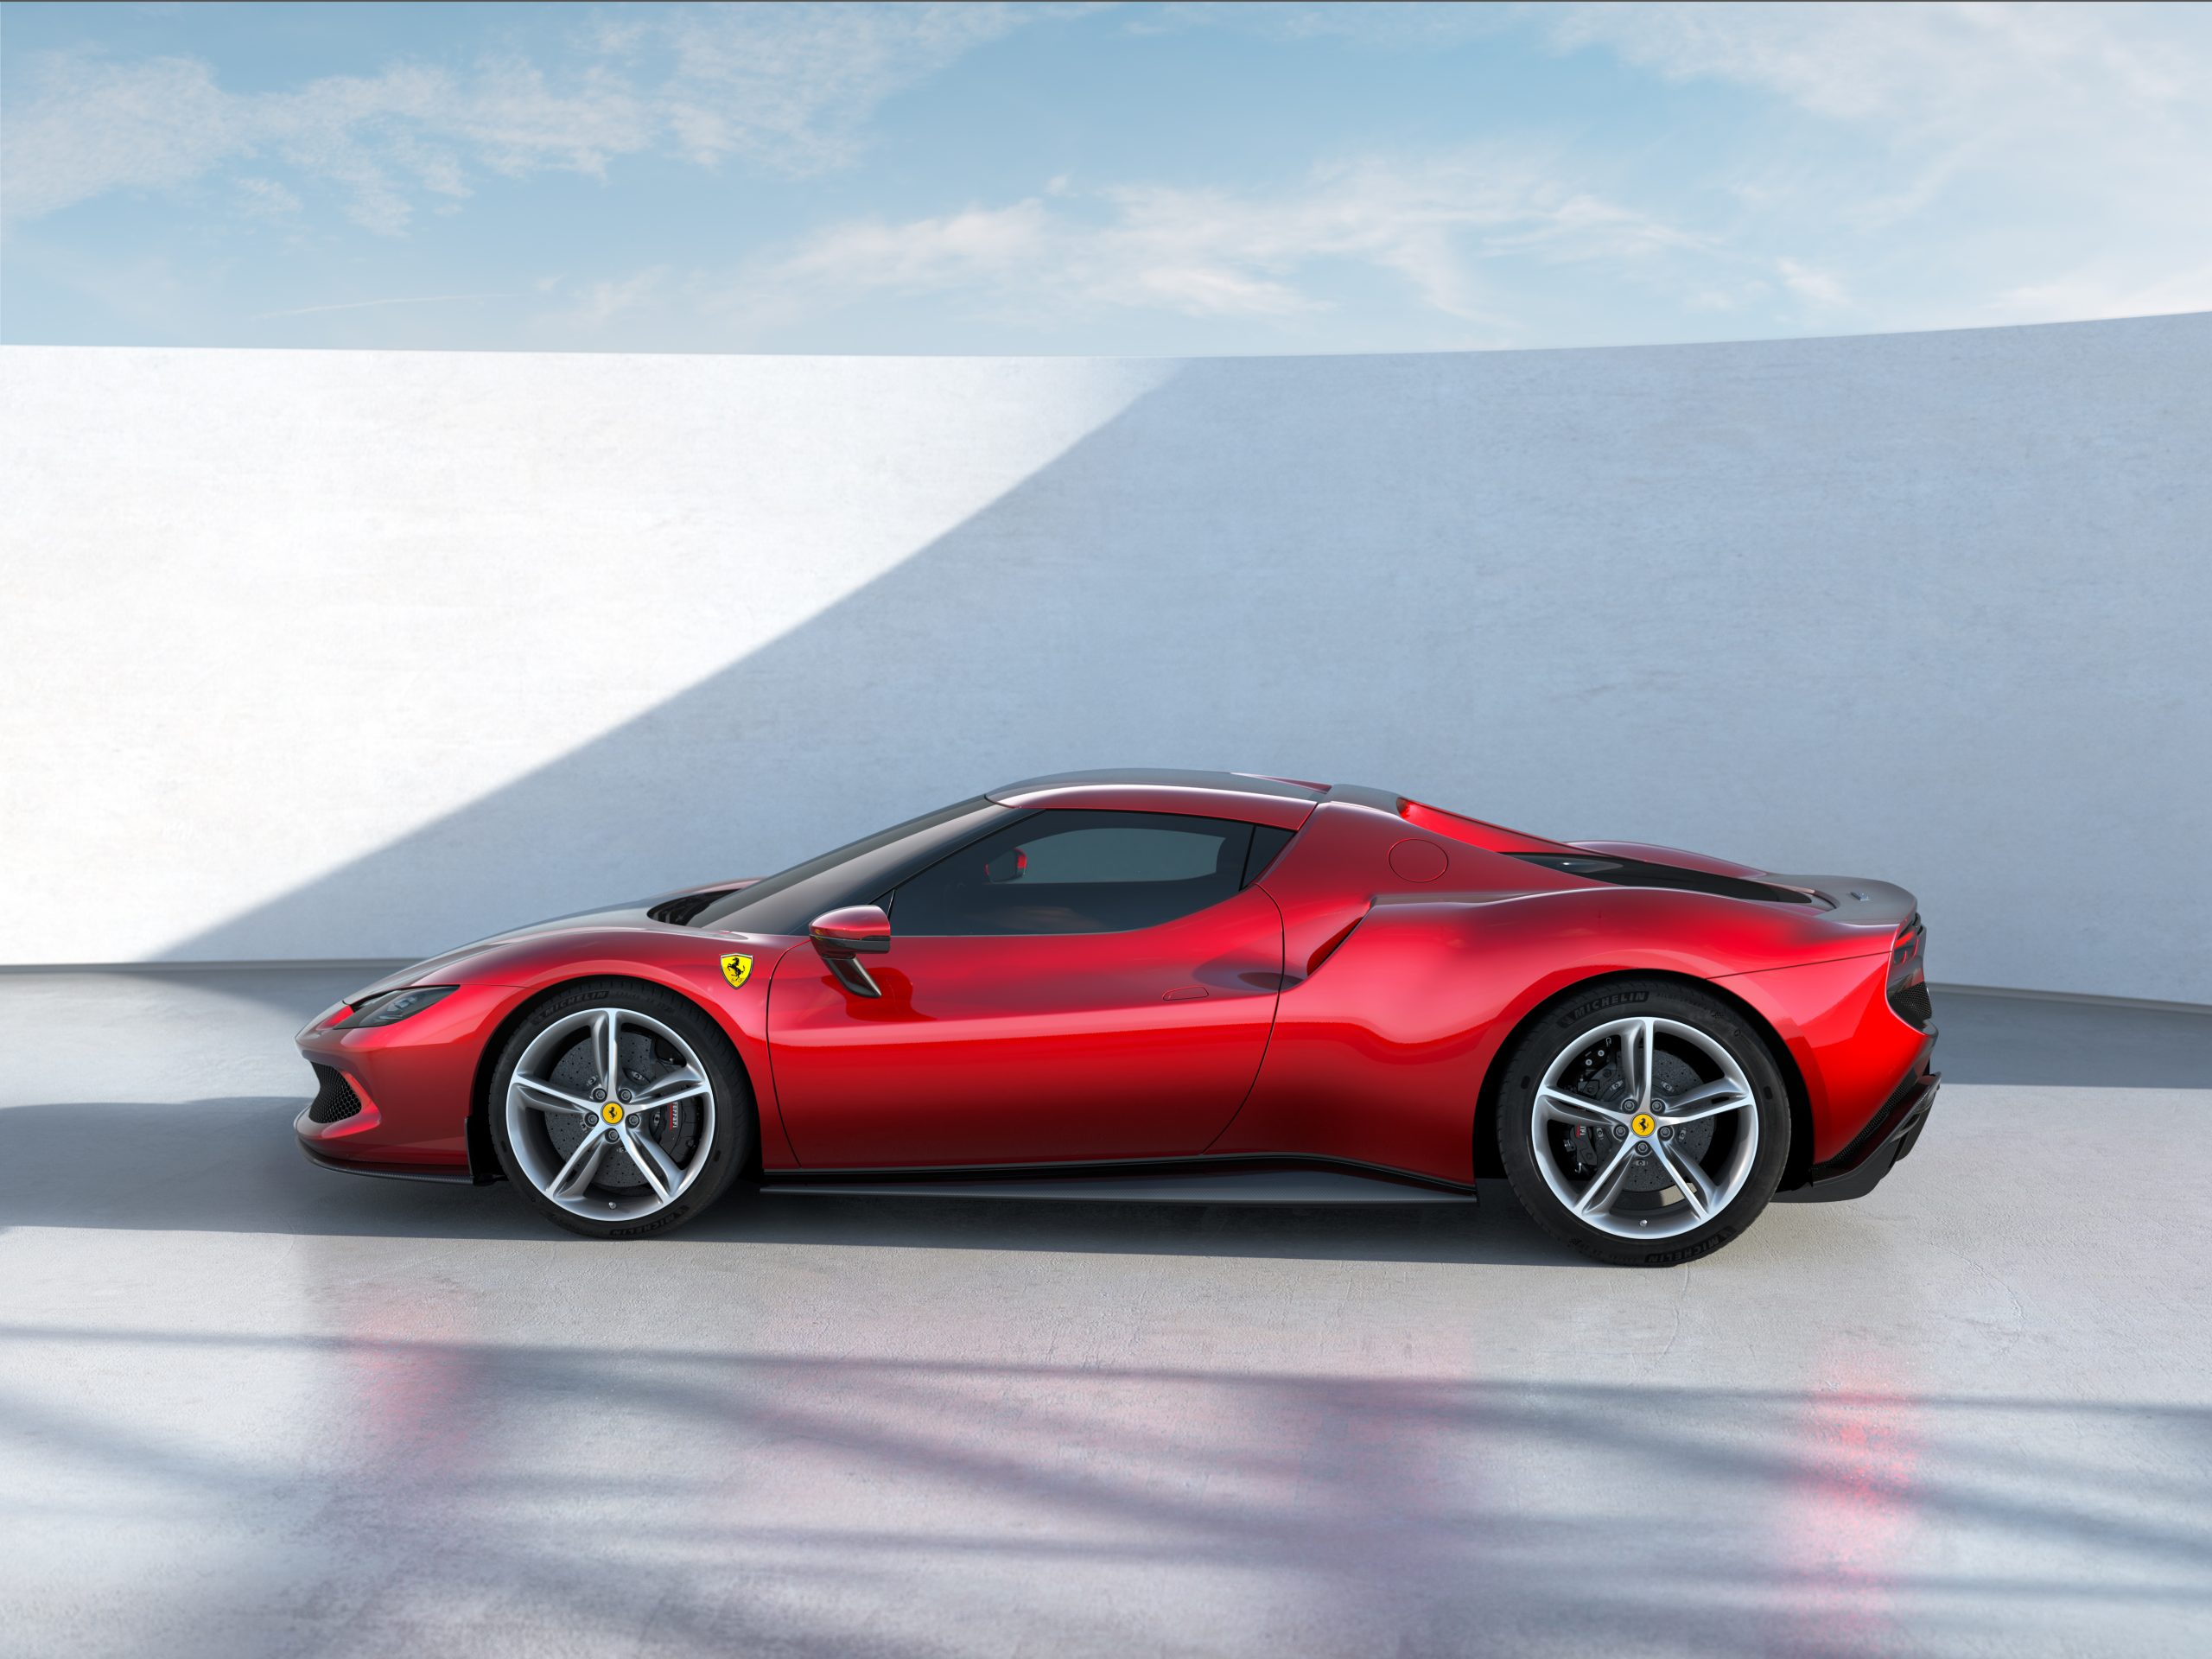 06 296 GTB side scaled Αυτή είναι η νέα Ferrari 296GTB 296GTB, Ferrari, Ferrari 296GTB, supercar, supercars, zblog, ειδήσεις, Νέα